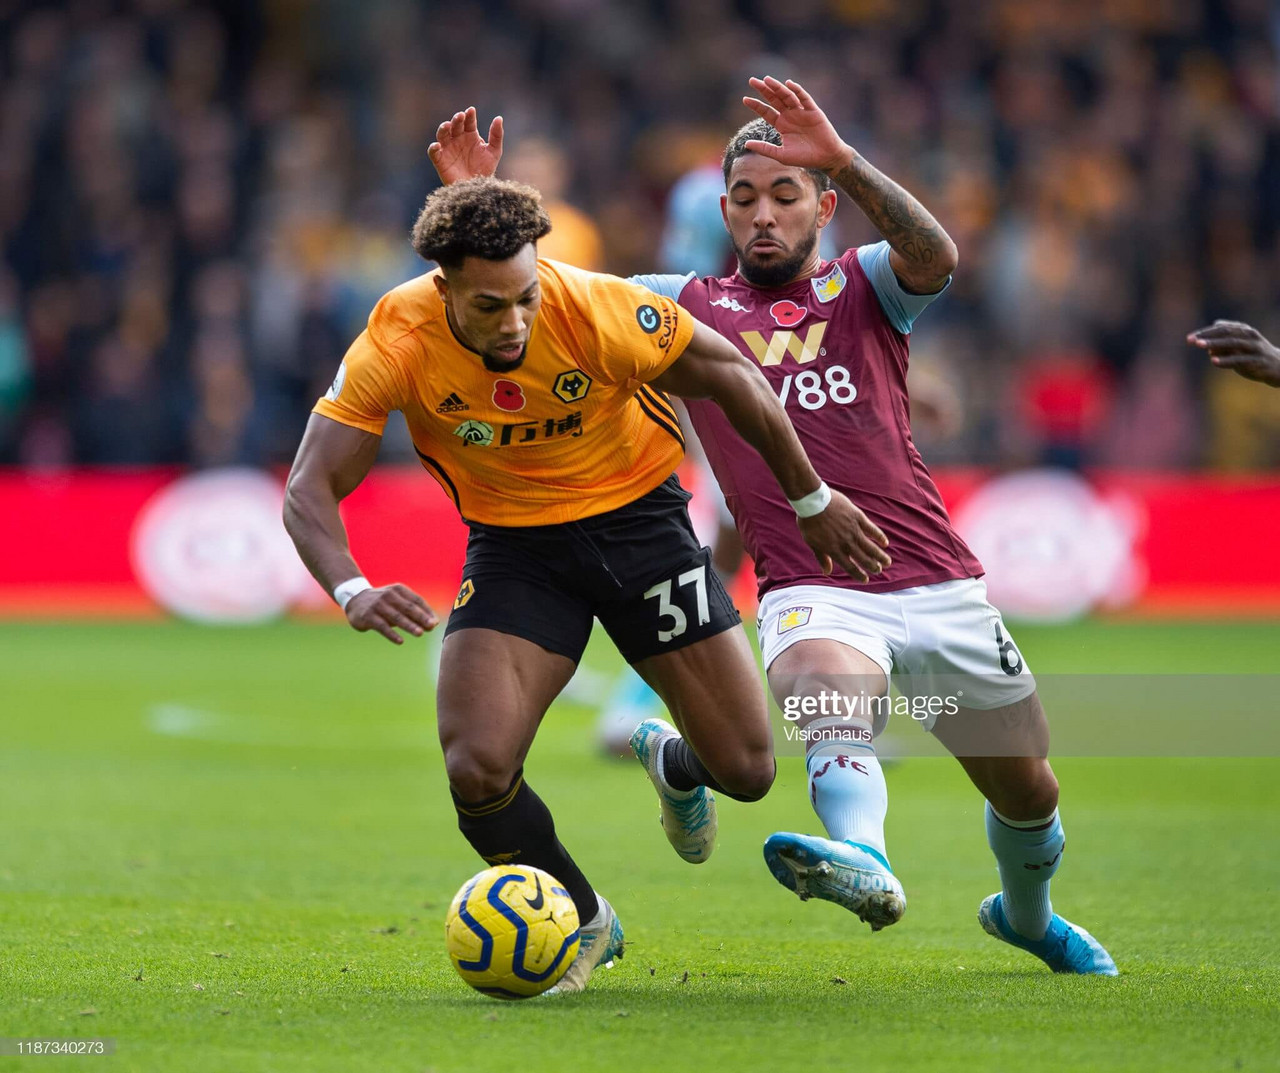 As it happened: Wolves 0-1 Aston Villa